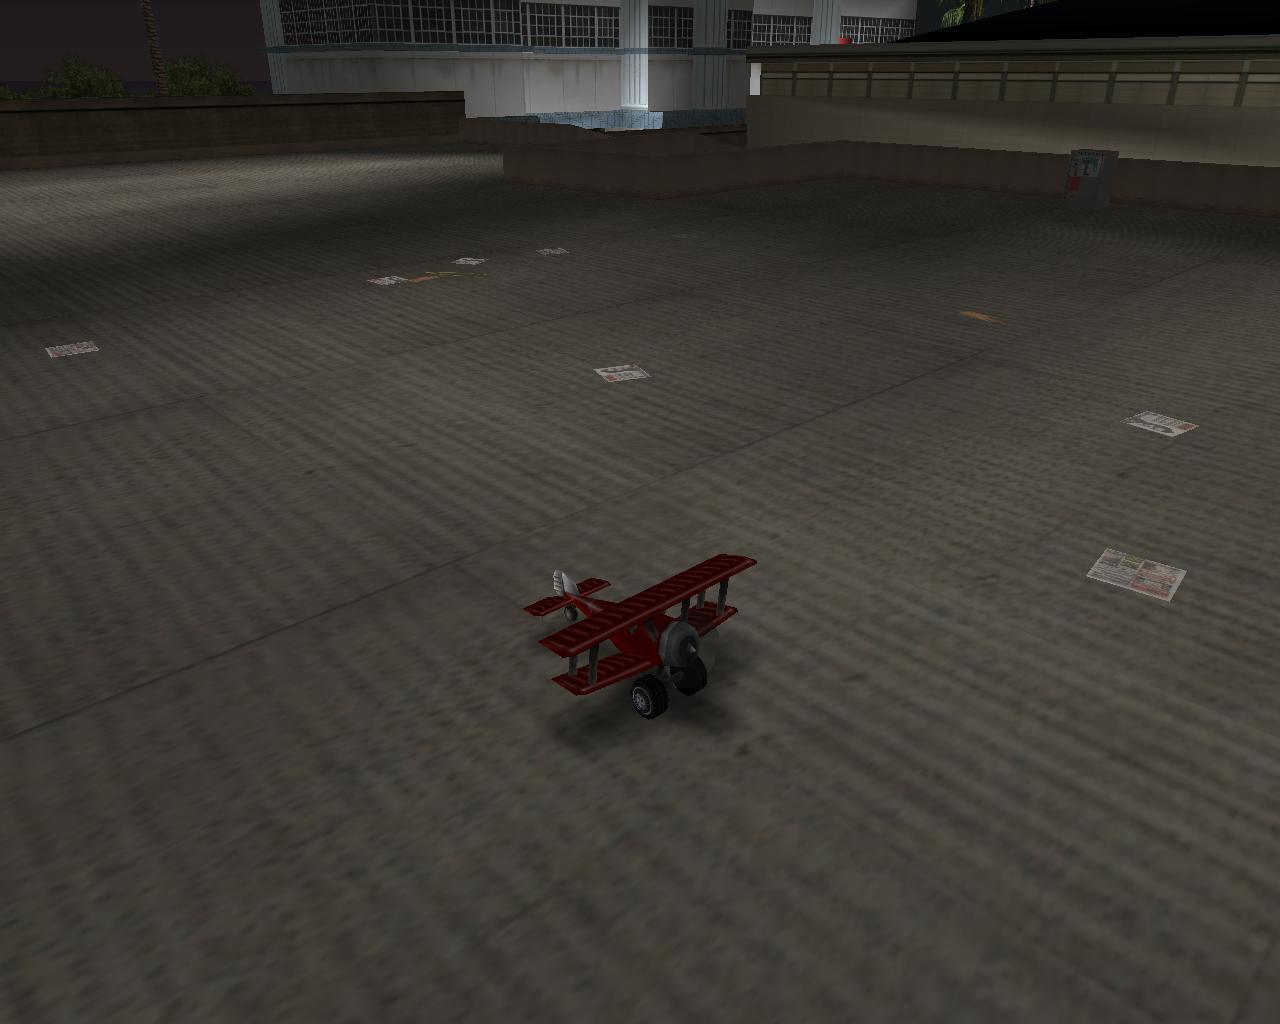 RC Baron - Grand Theft Auto: Vice City